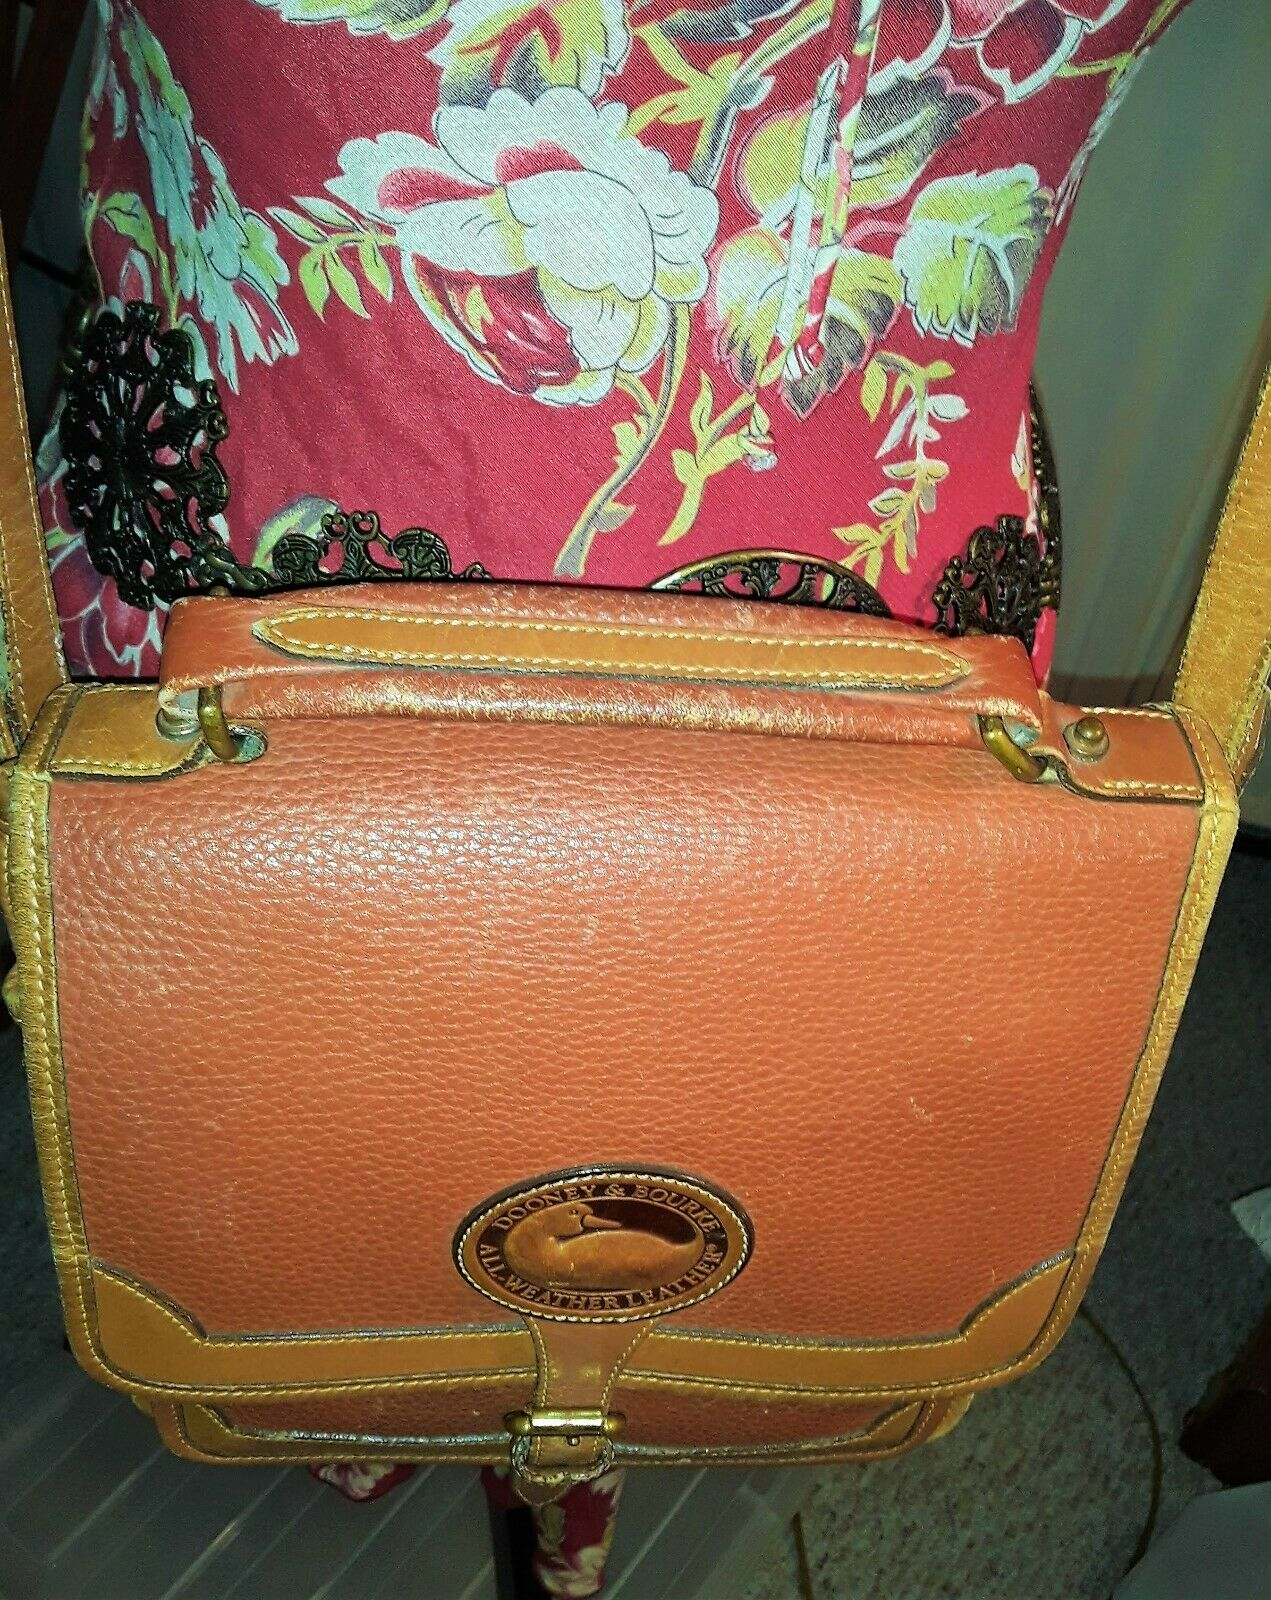 Vintage Dooney & Bourke Messenger Crossbody Purse… - image 4